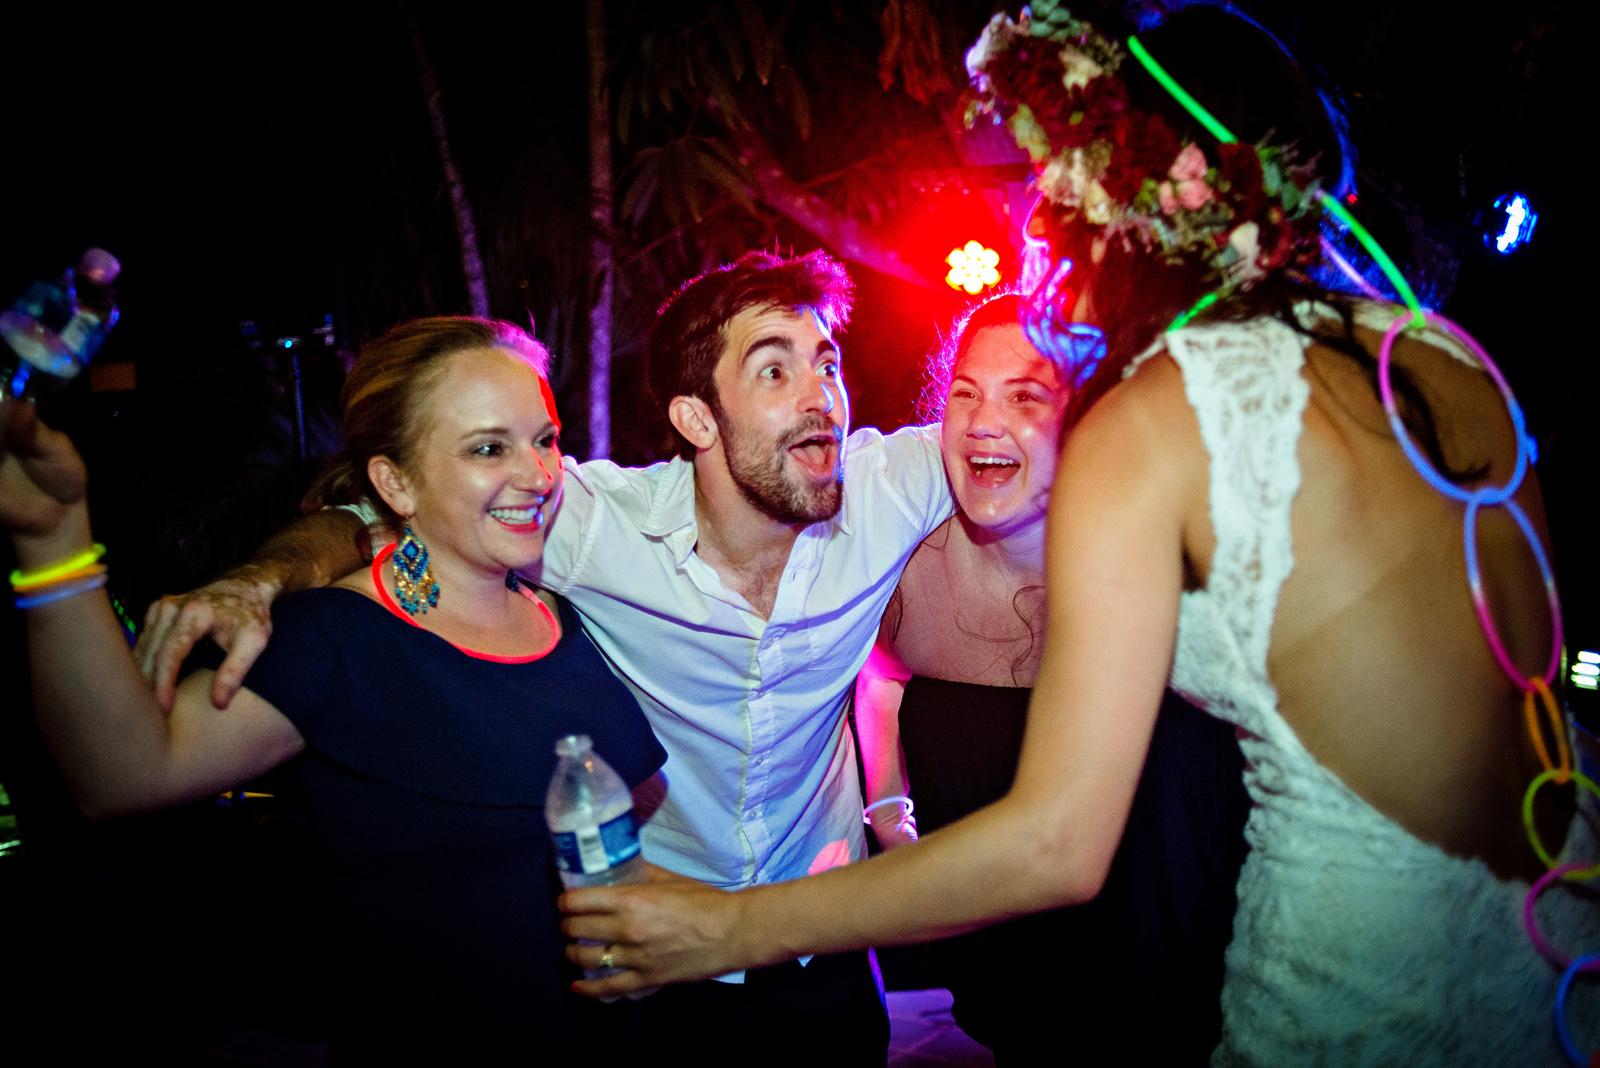 Villa-amor-sayulita-destination-wedding-mexico-099